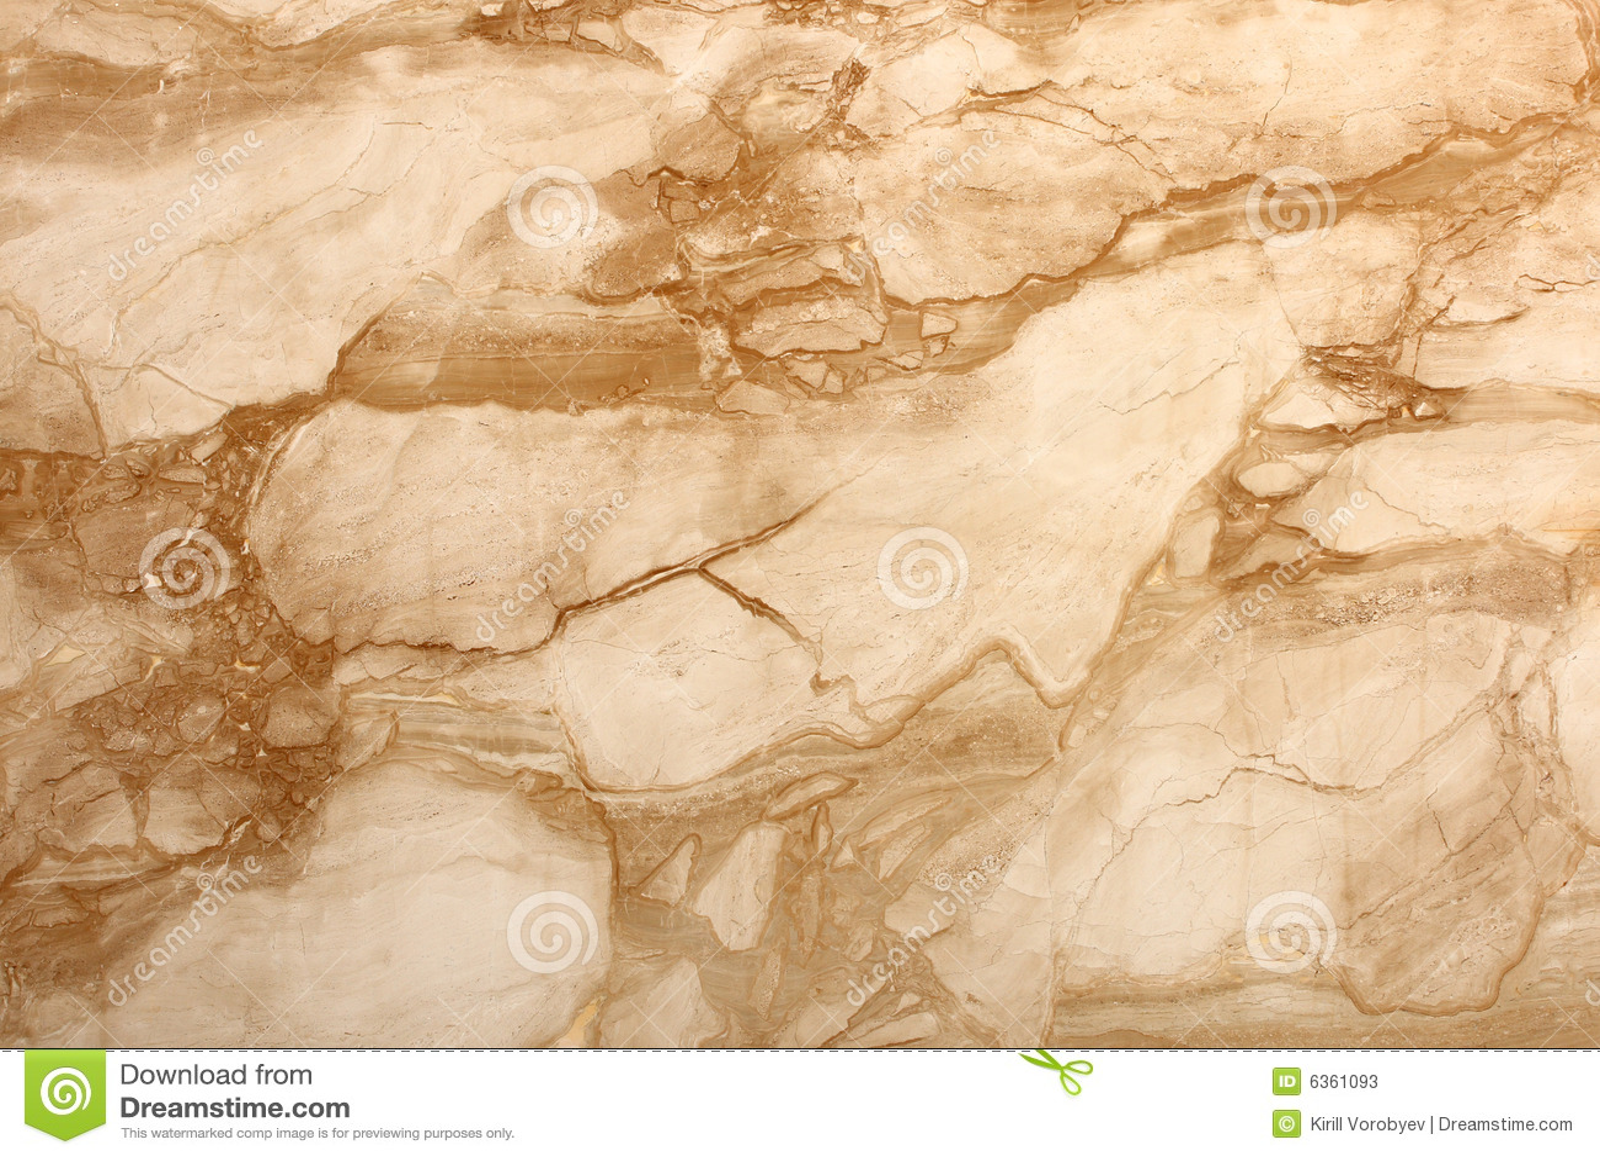 Fußboden Aus Packpapier ~ Marmormuster stockbild. bild von fußboden papier punkt 6361093